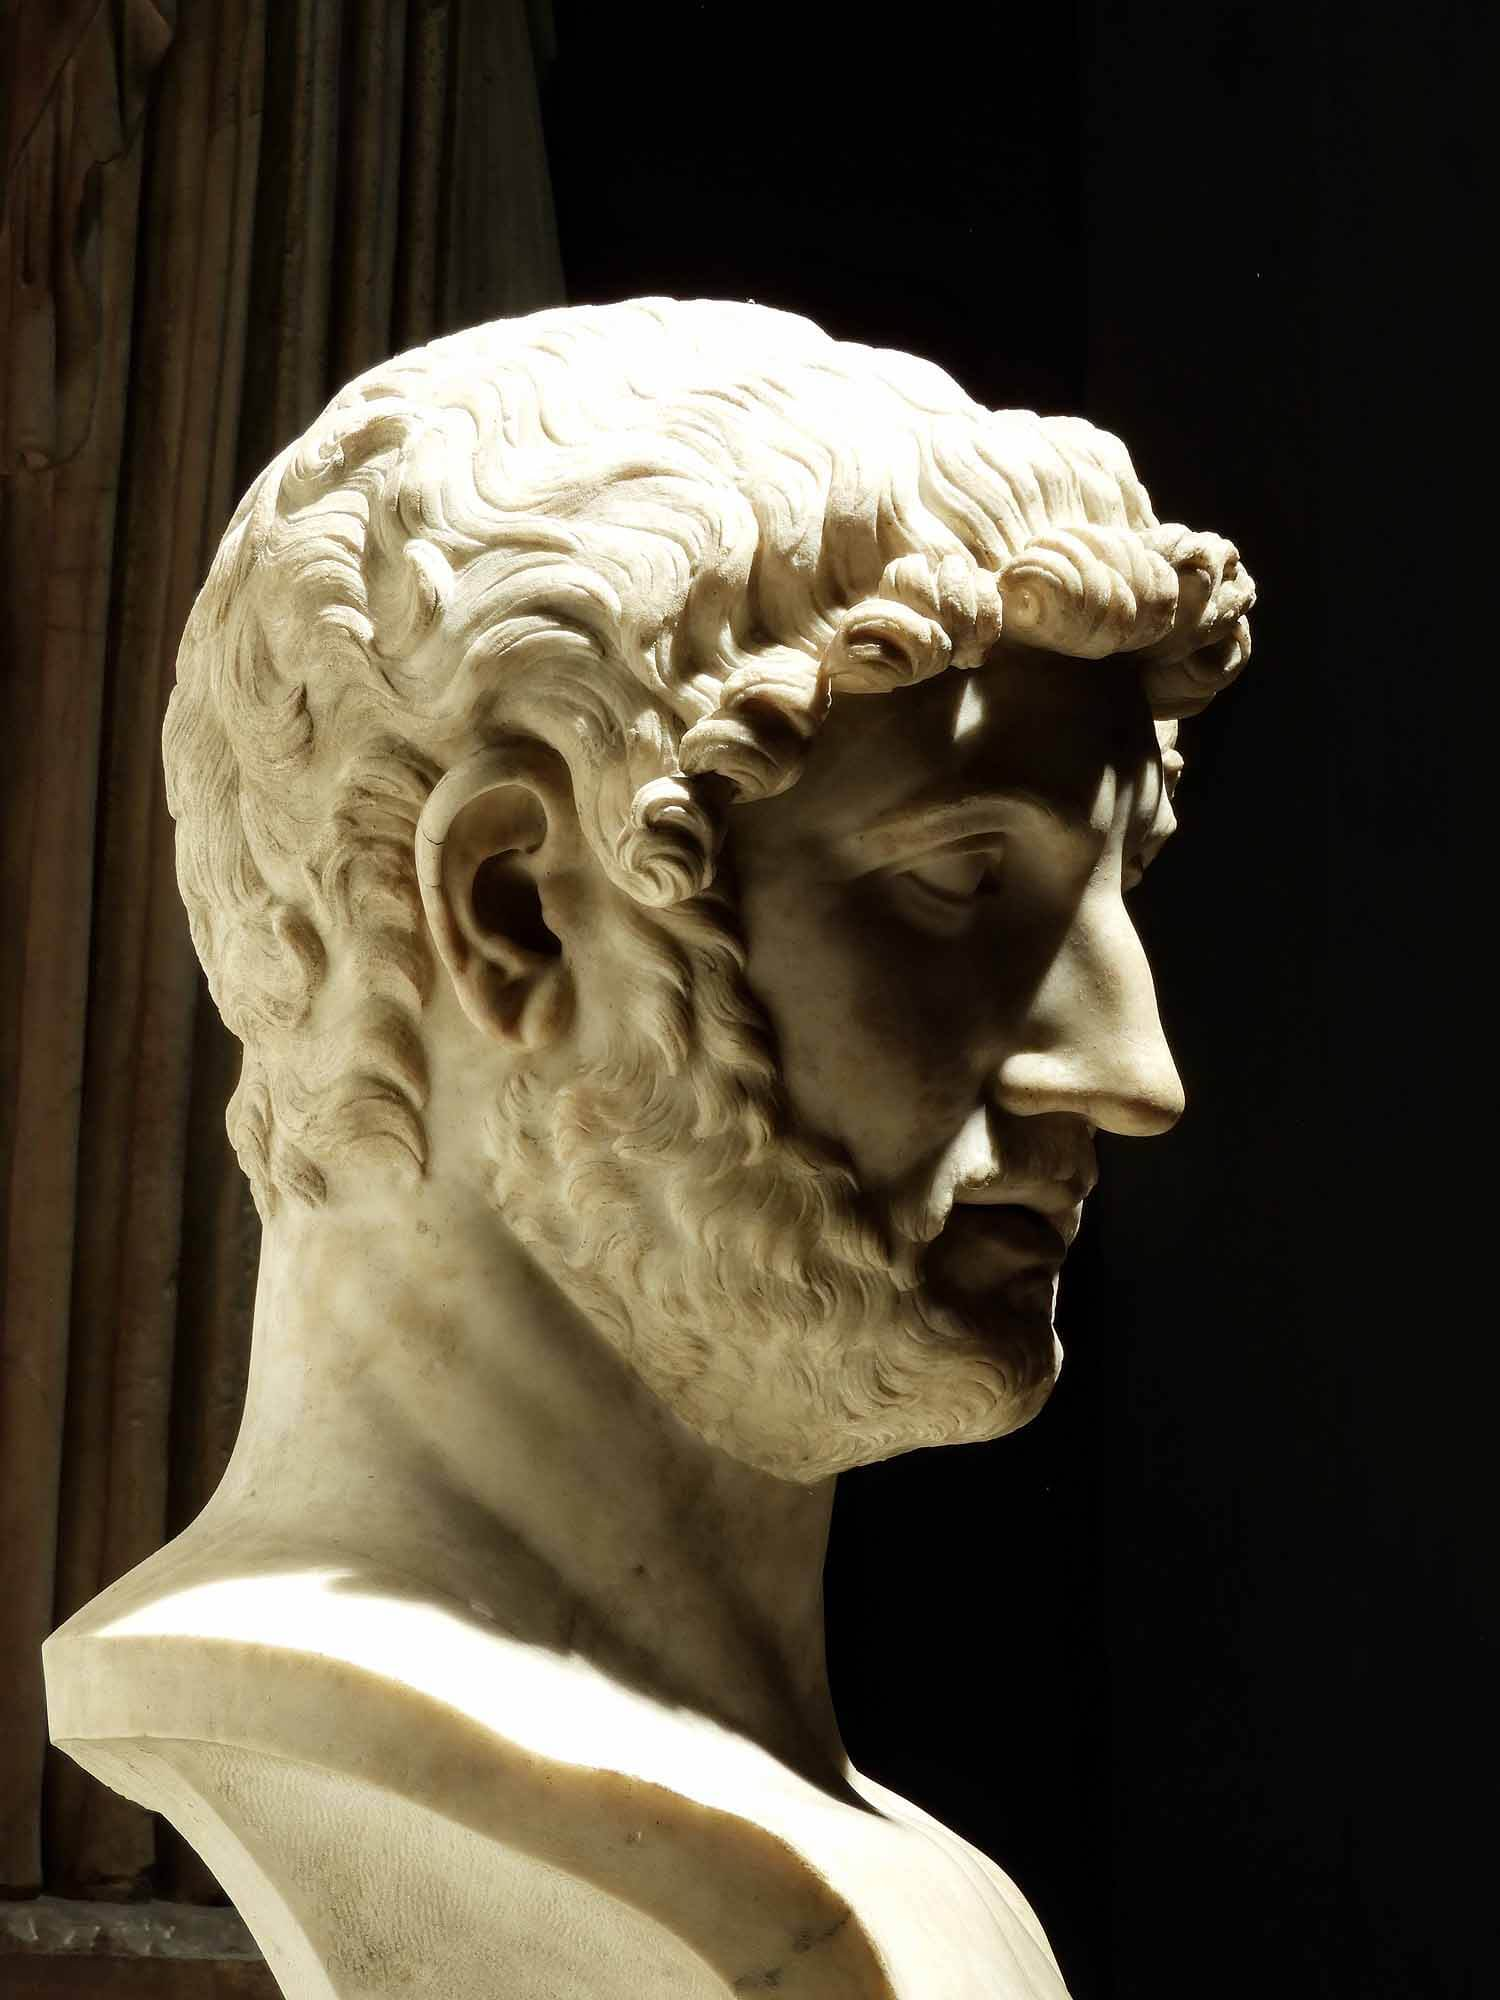 vatican-city-holy-see-italy-italia-rome-roman-bust.jpg